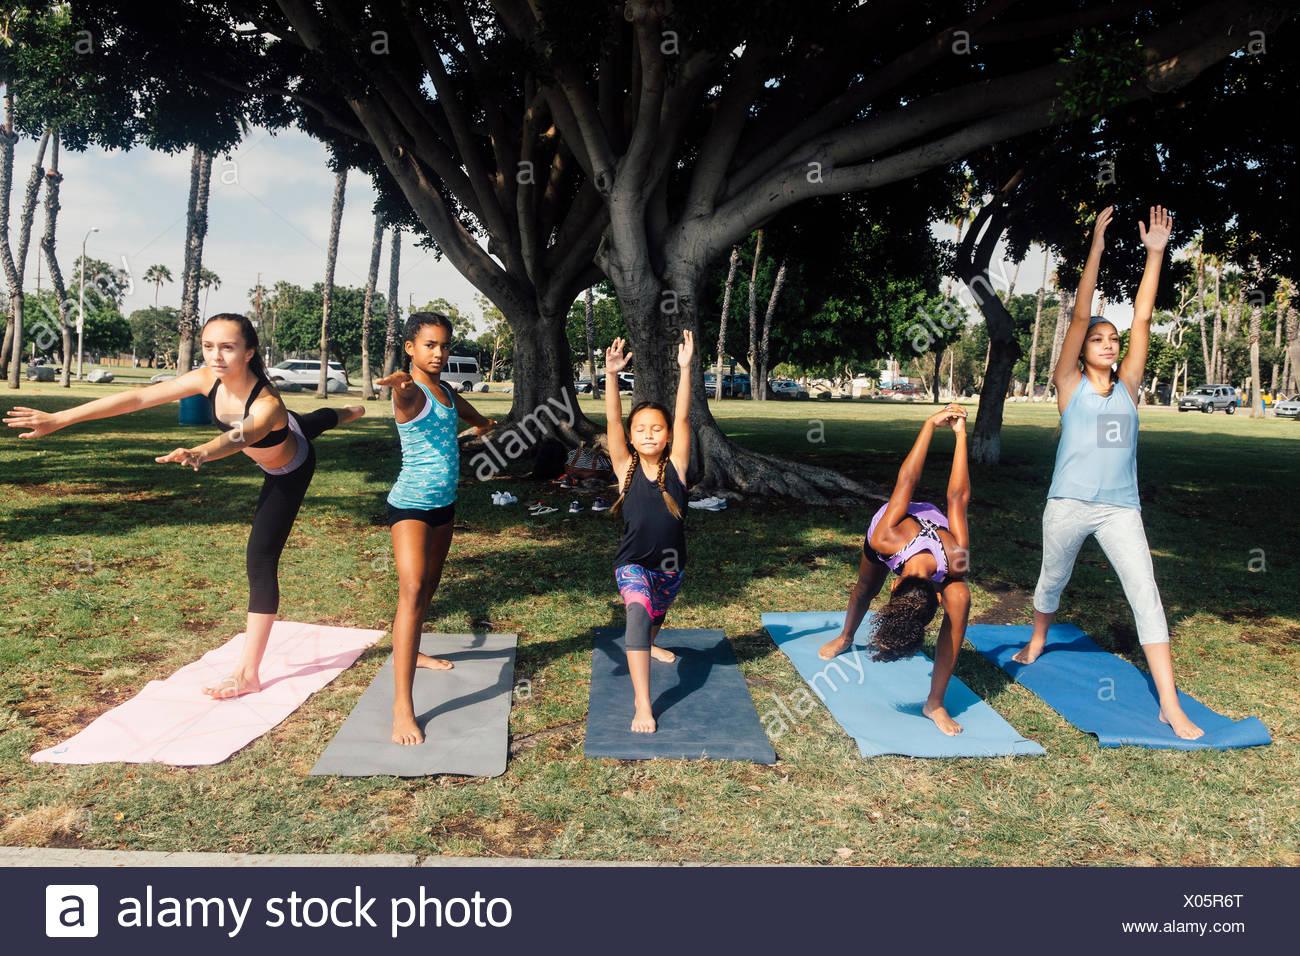 Girls and teenage schoolgirls practicing yoga warrior pose on school playing field - Stock Image